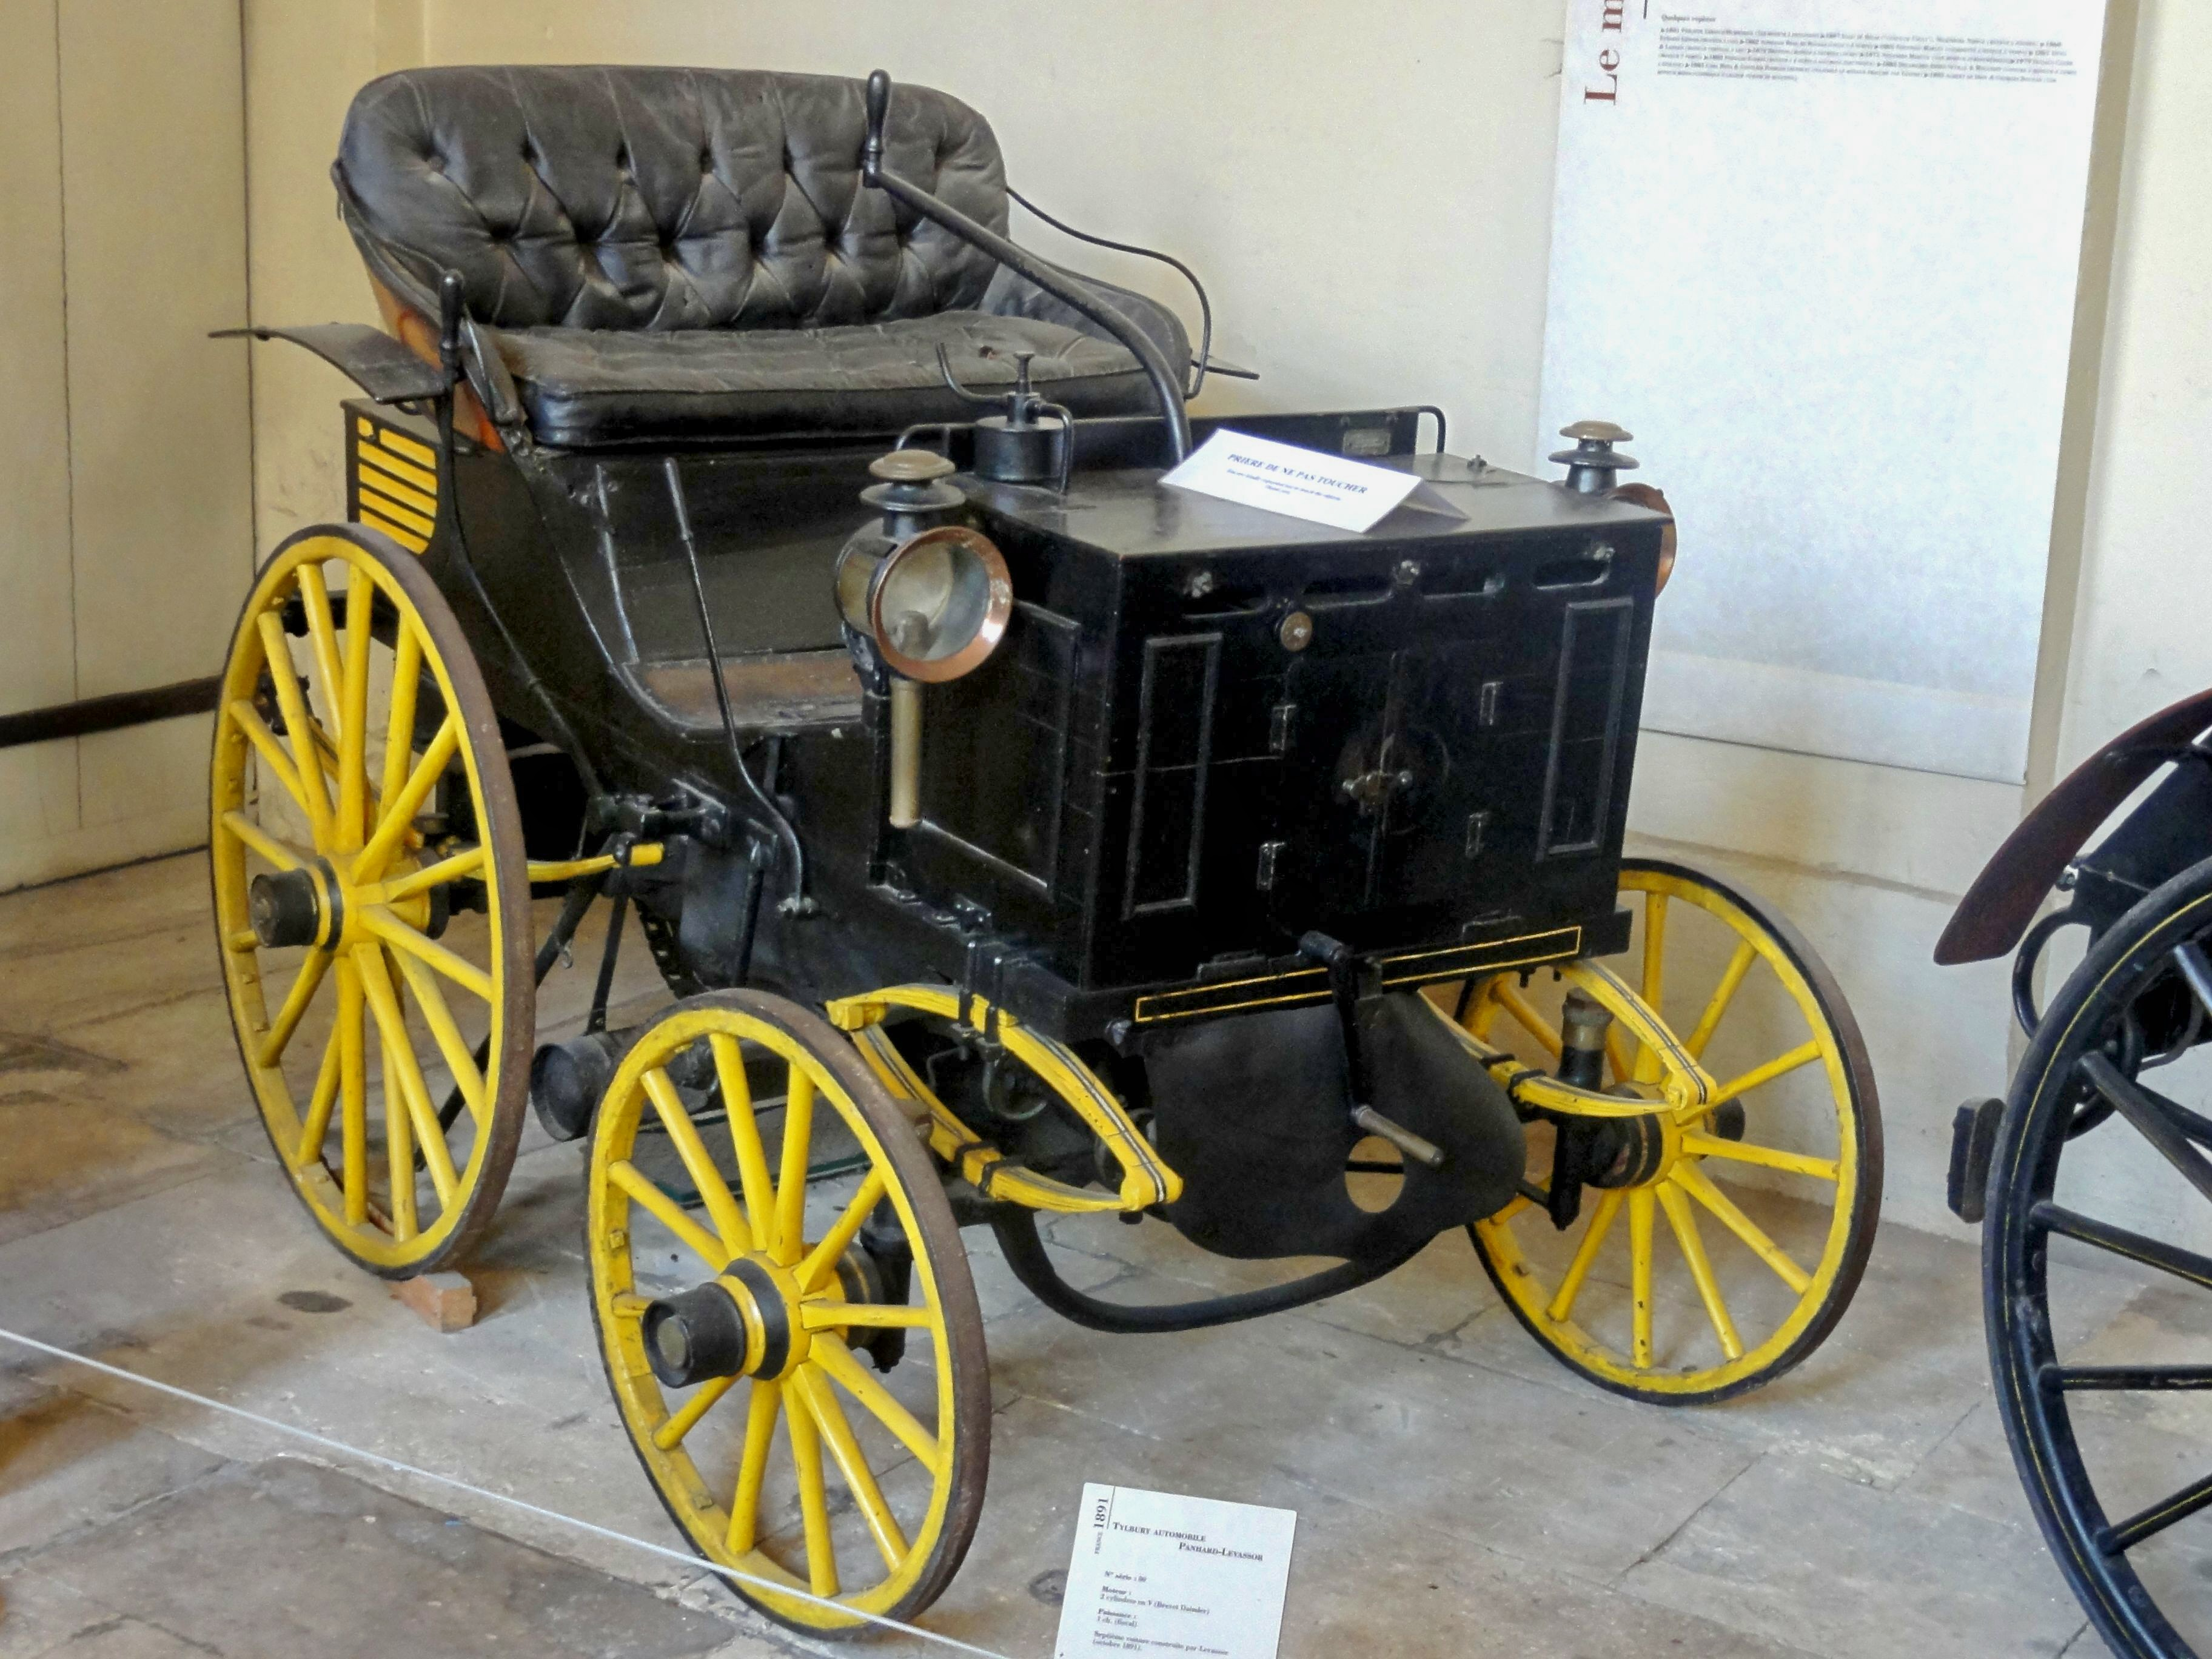 file compi gne 60 mus e de la voiture tilbury automobile panhard levassor 1891. Black Bedroom Furniture Sets. Home Design Ideas